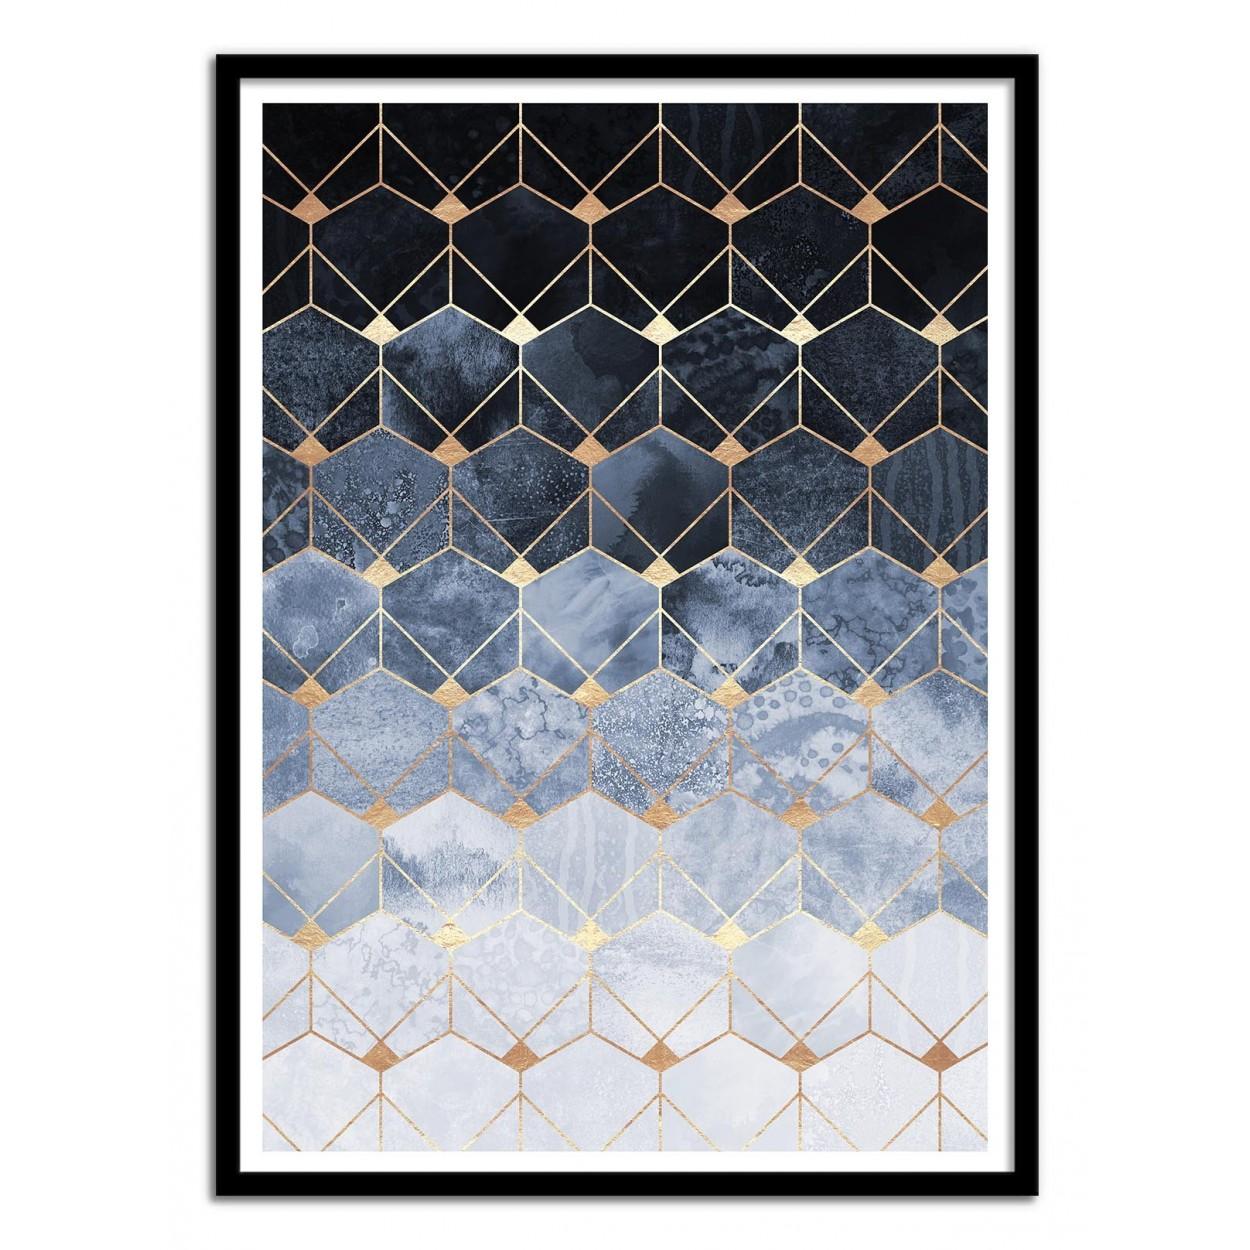 Poster design 50x70 -  Art Poster 50 X 70 Cm Blue Hexagons Diamonds Elisabeth Fredriksson